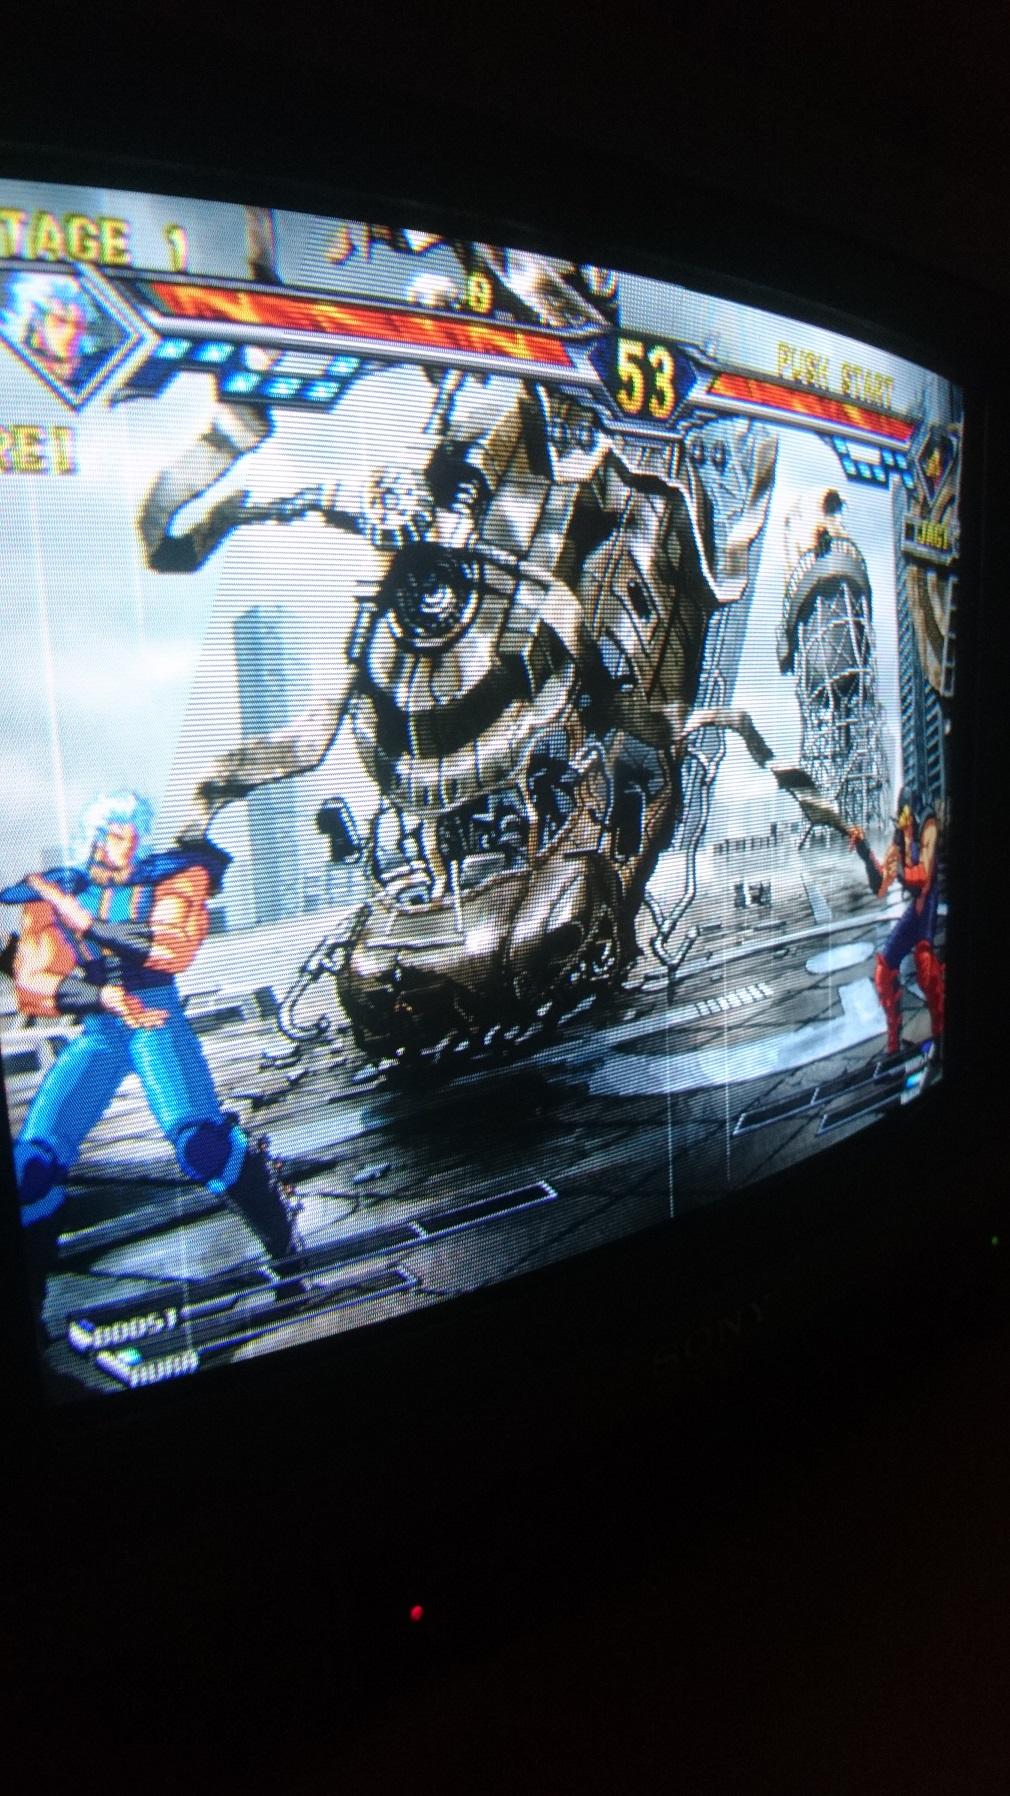 sony pvm 1440qm repair log - Monitor Help - Arcade-Projects